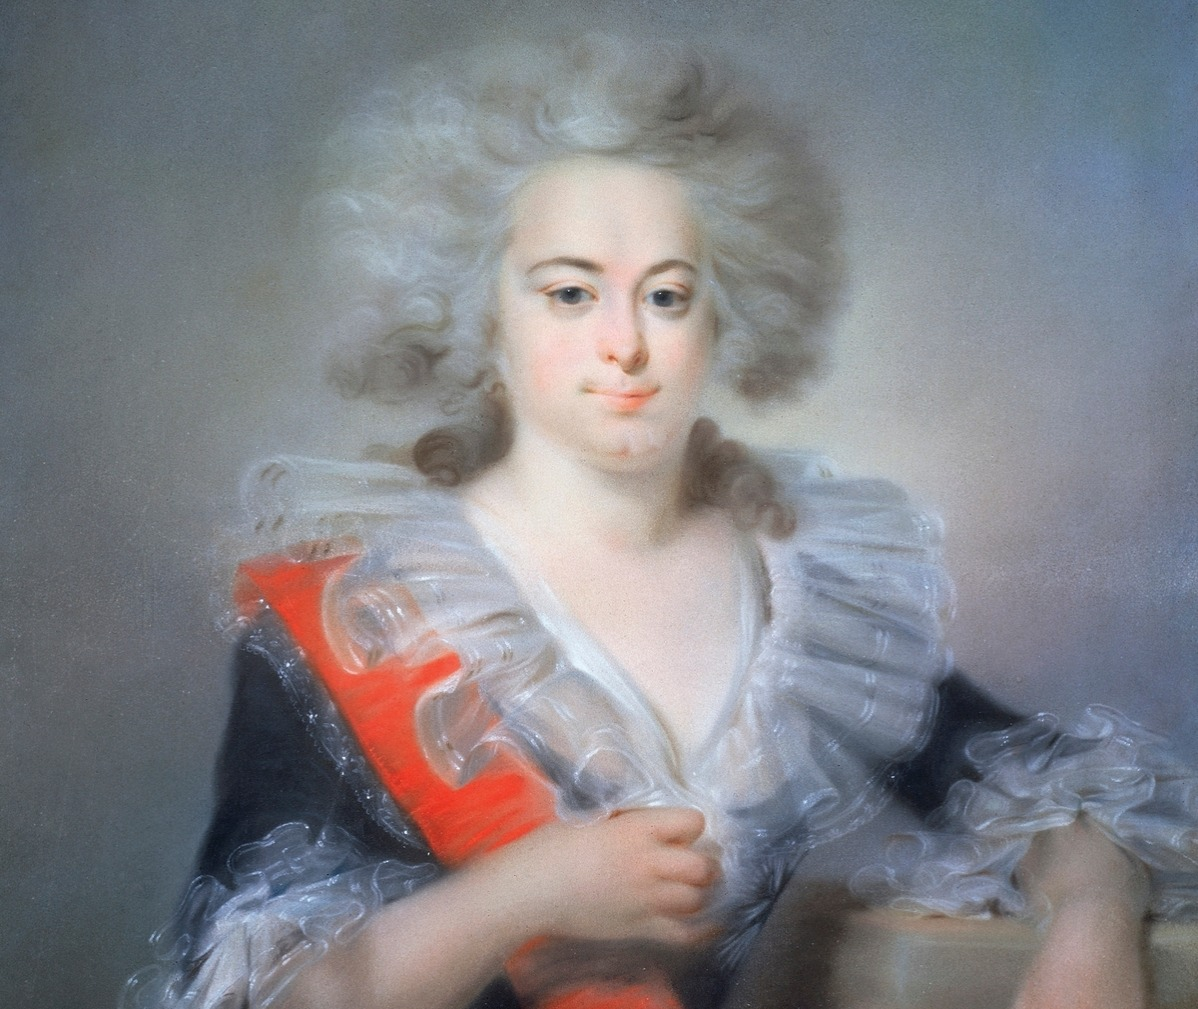 Sophia Augusta Frederica or Catherine II vaccinations in Russia against smallpox